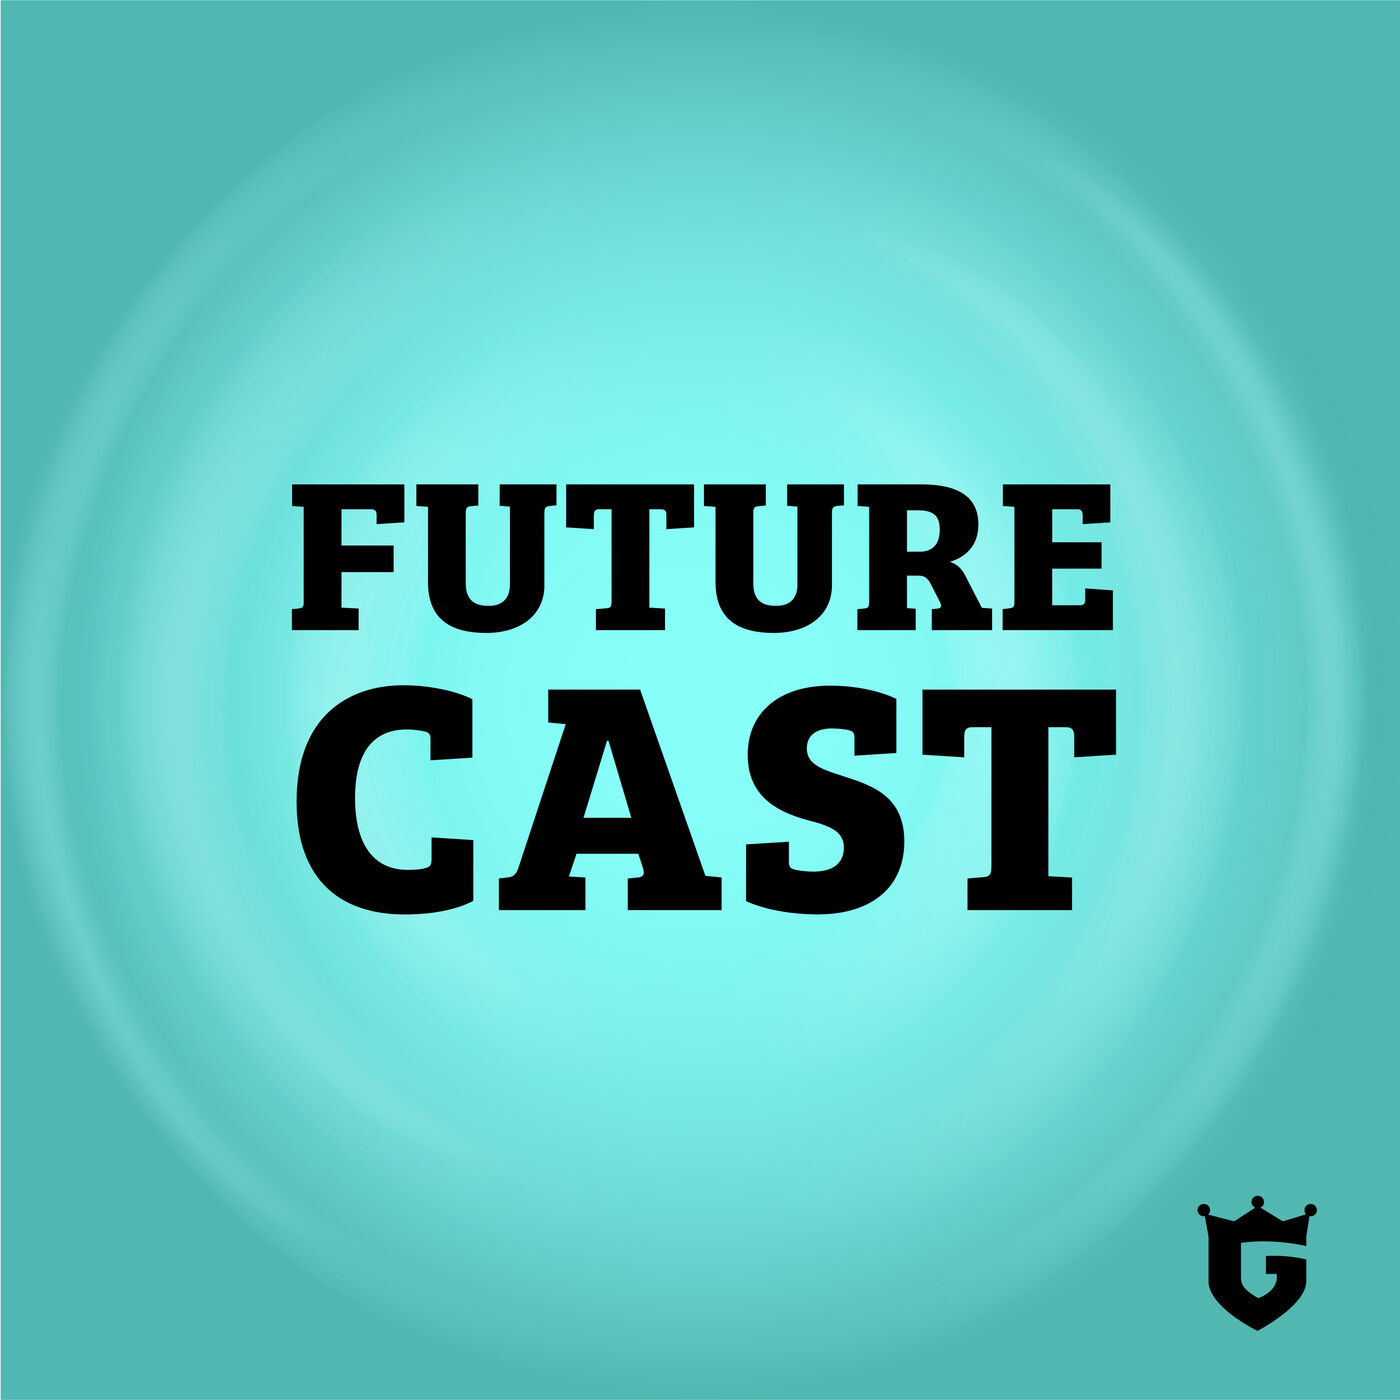 RVK Futurecast #2: Hjalmar Gislason, the Co-Founder and CEO of Grid